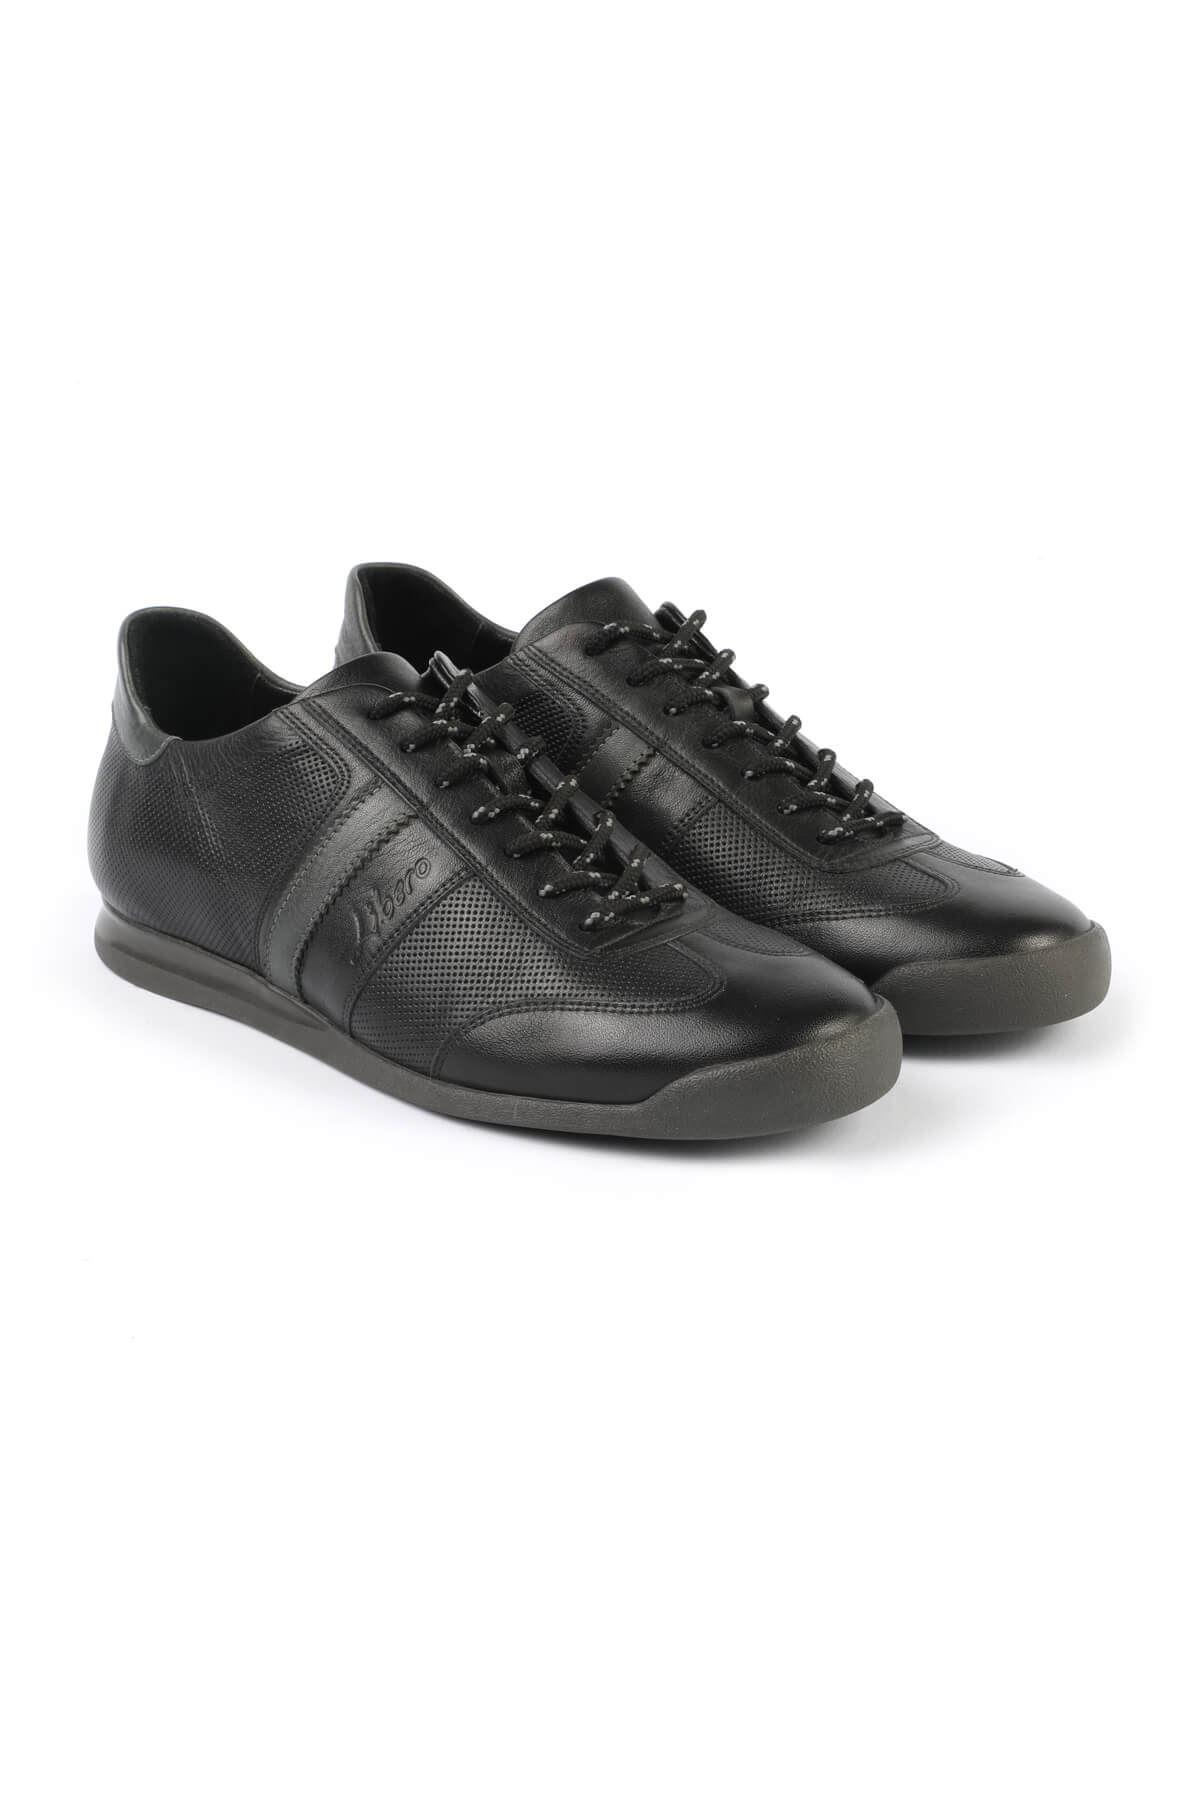 Libero 2992 Black Casual Shoes